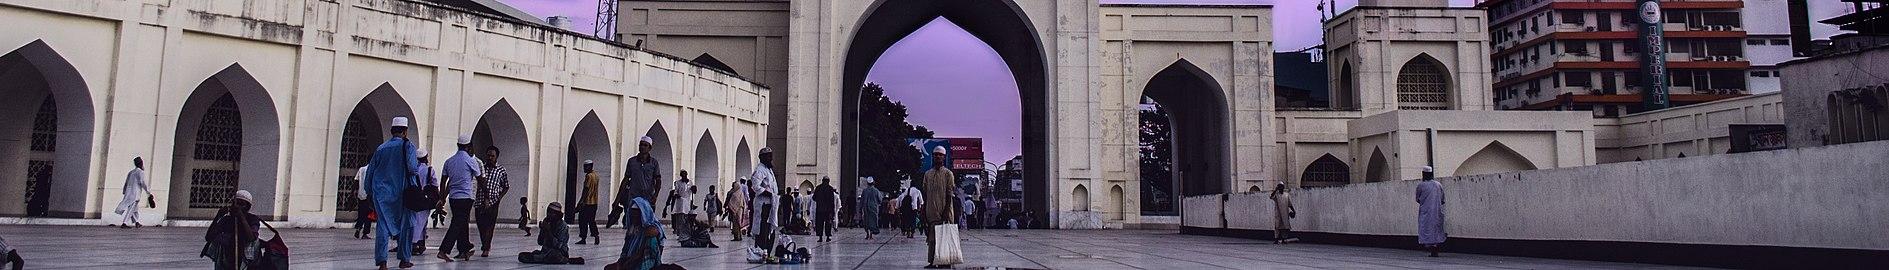 A portion of Baitul Mukarram (15282186851) (cropped).jpg